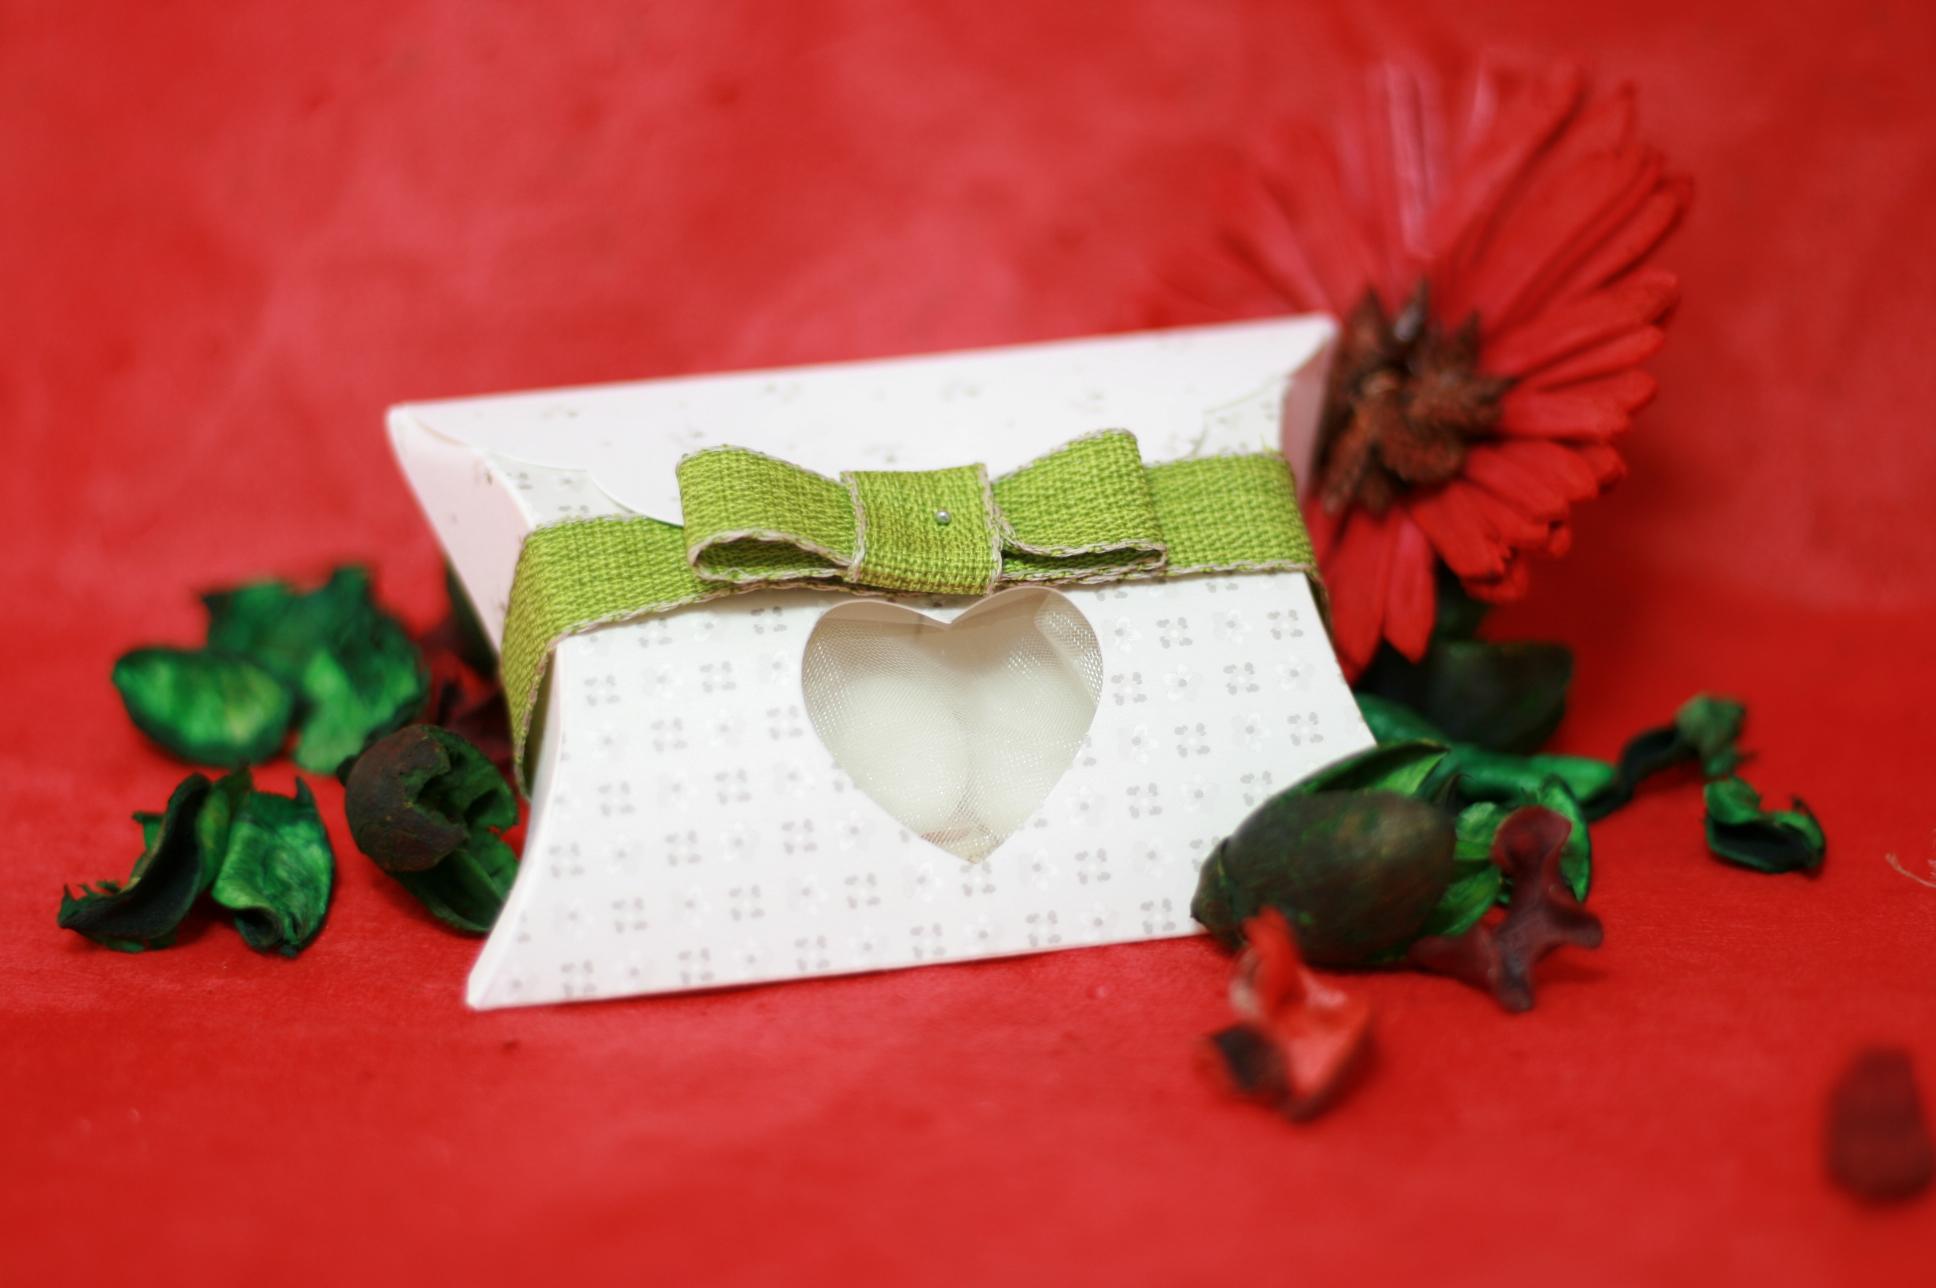 Scatola bianca con cuore + nastro verde